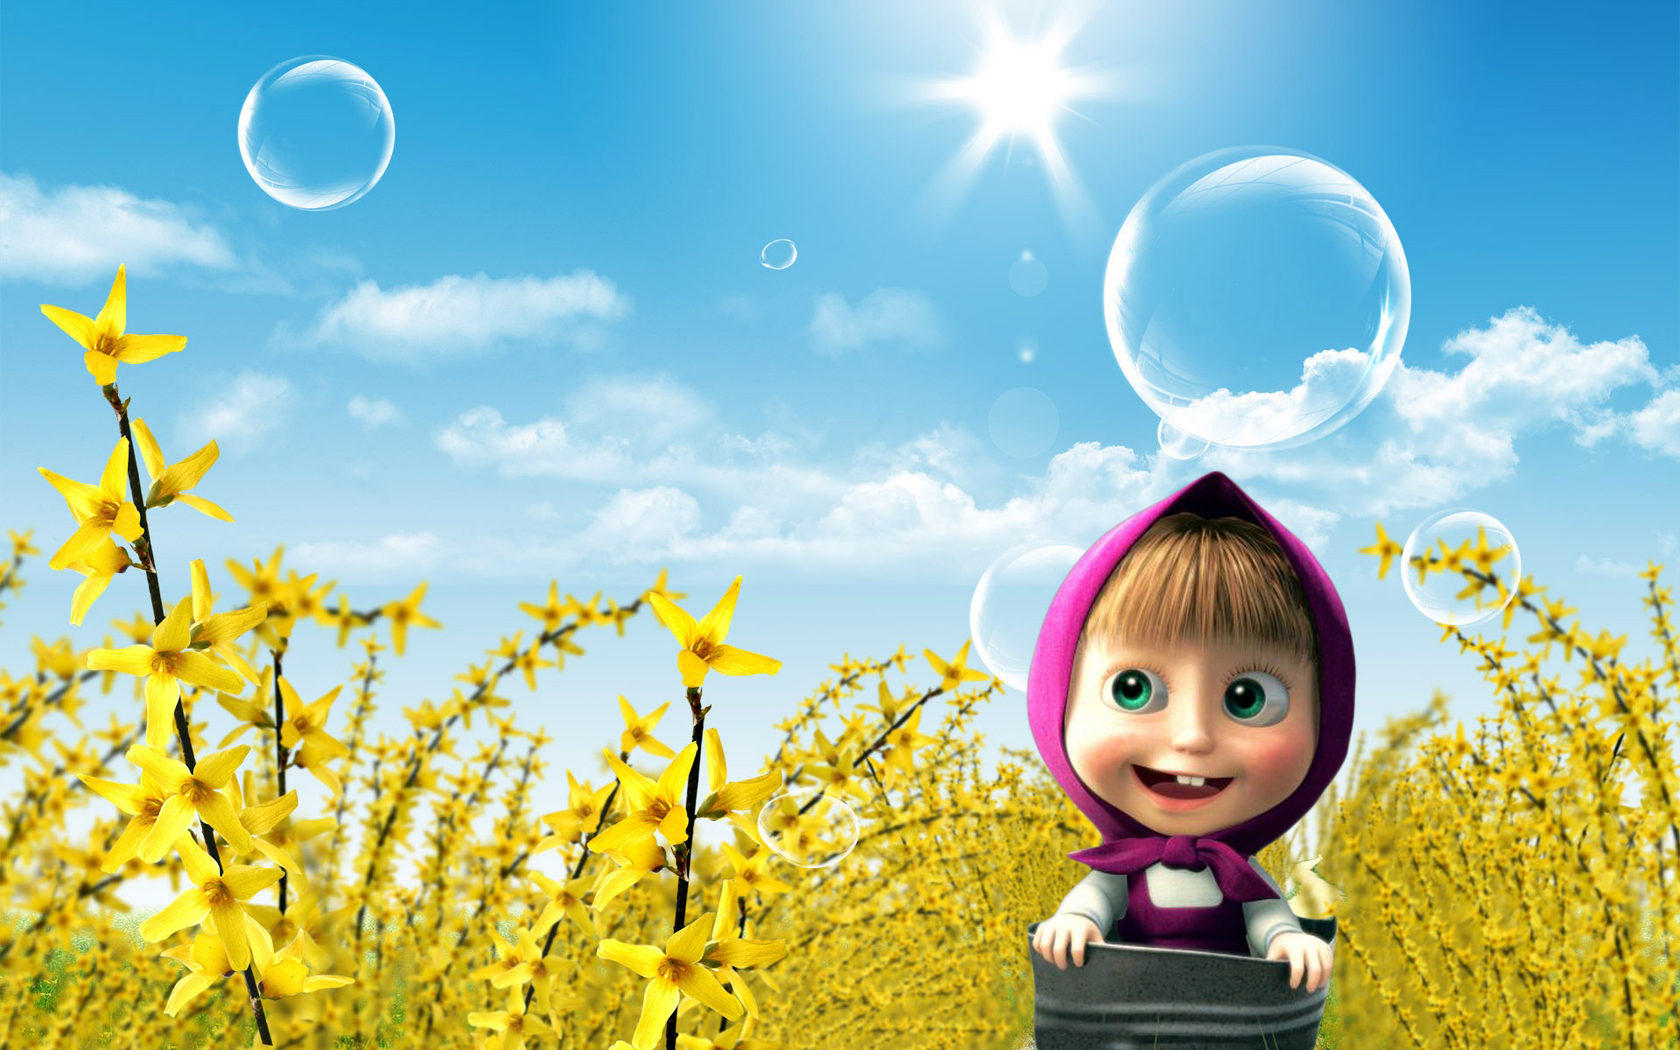 Animated Wallpapers Animated Baby Girl Wallpaper